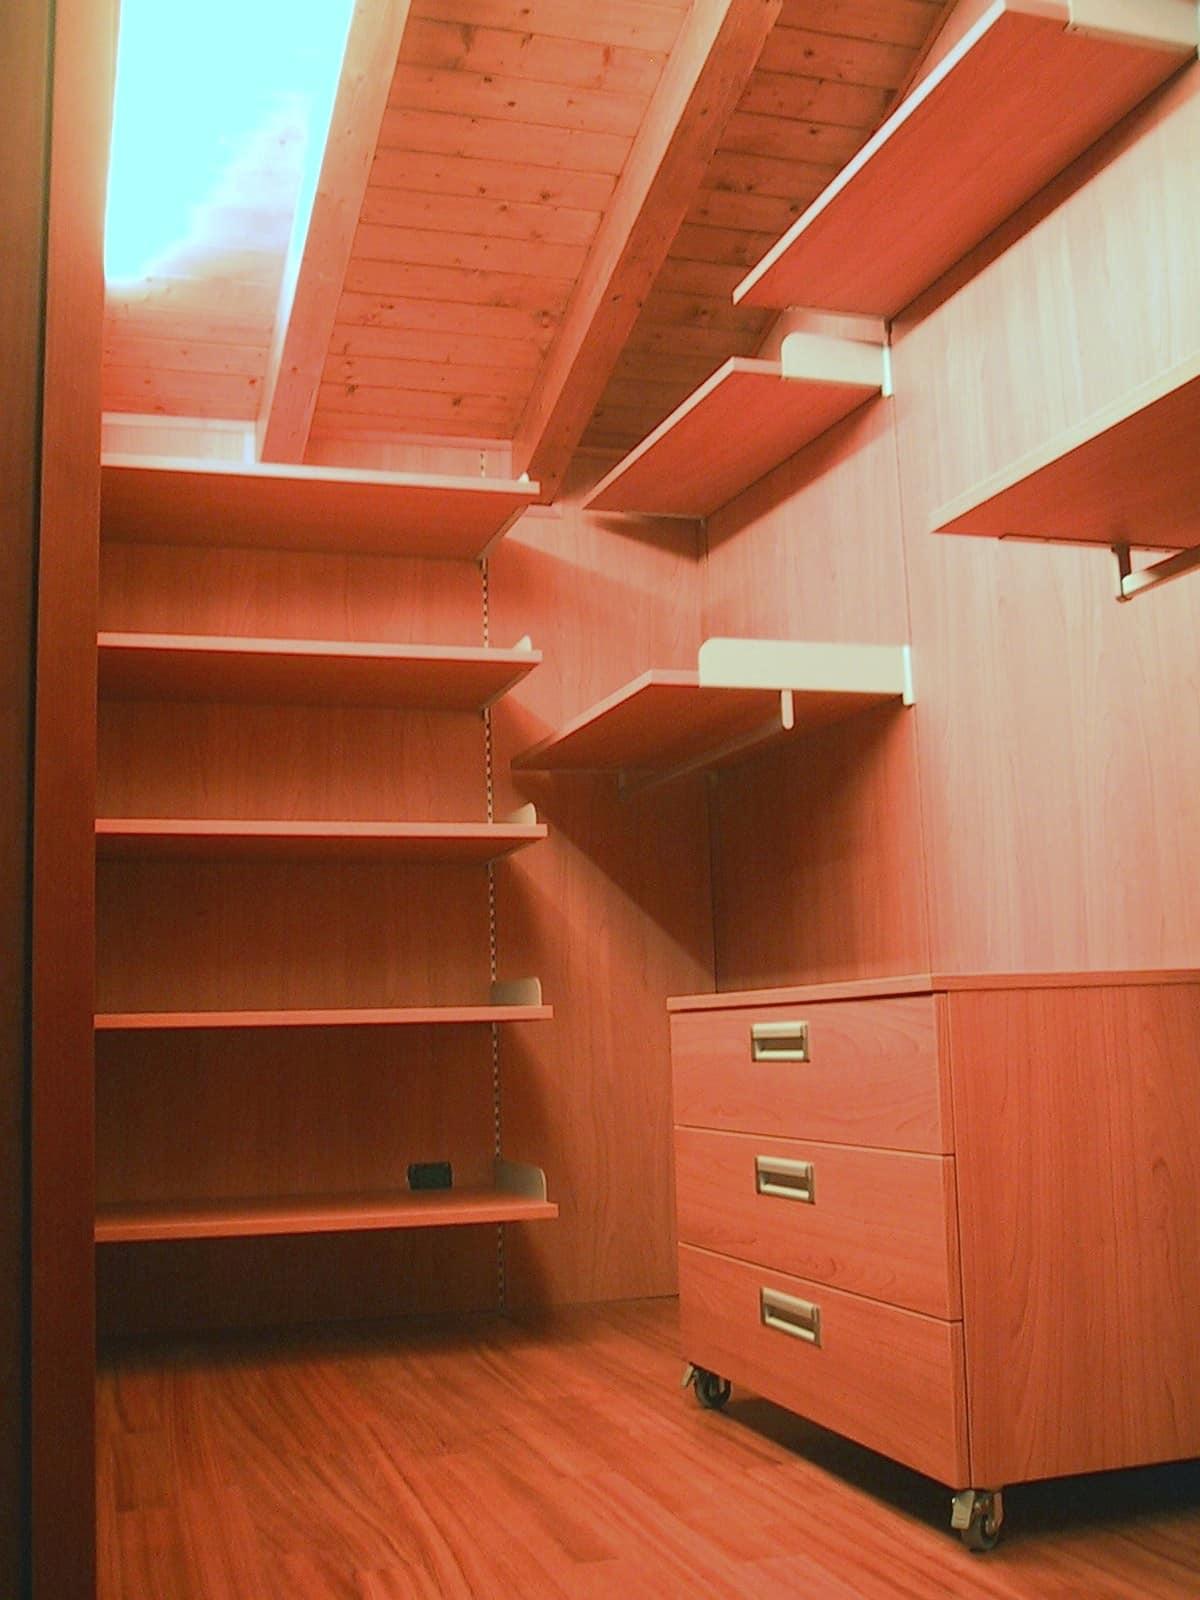 Walk-in closet for the attic 01, Walk-in closet fully customizable